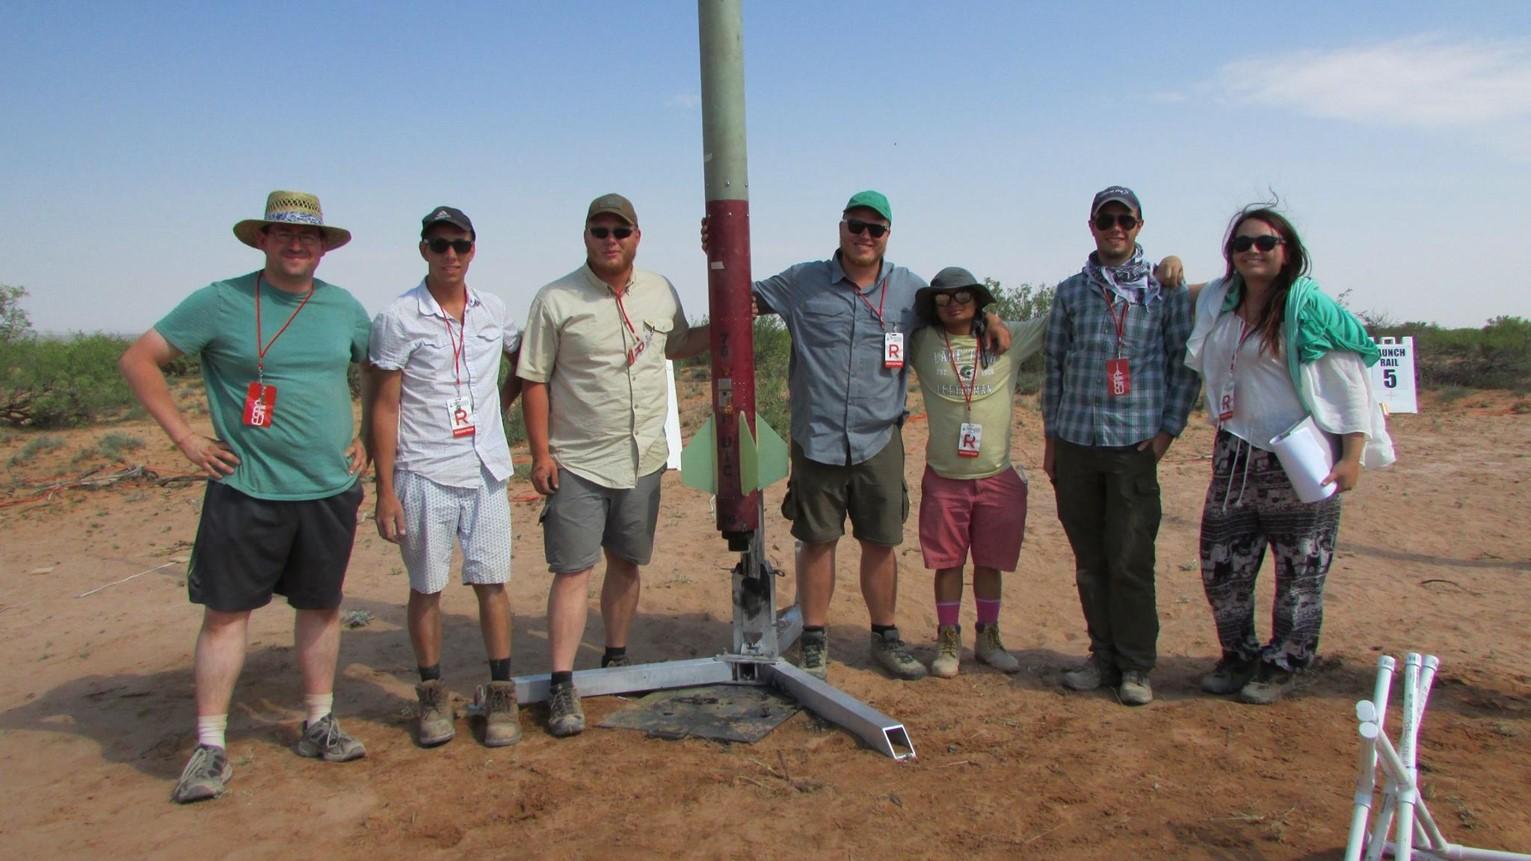 team posing in the field